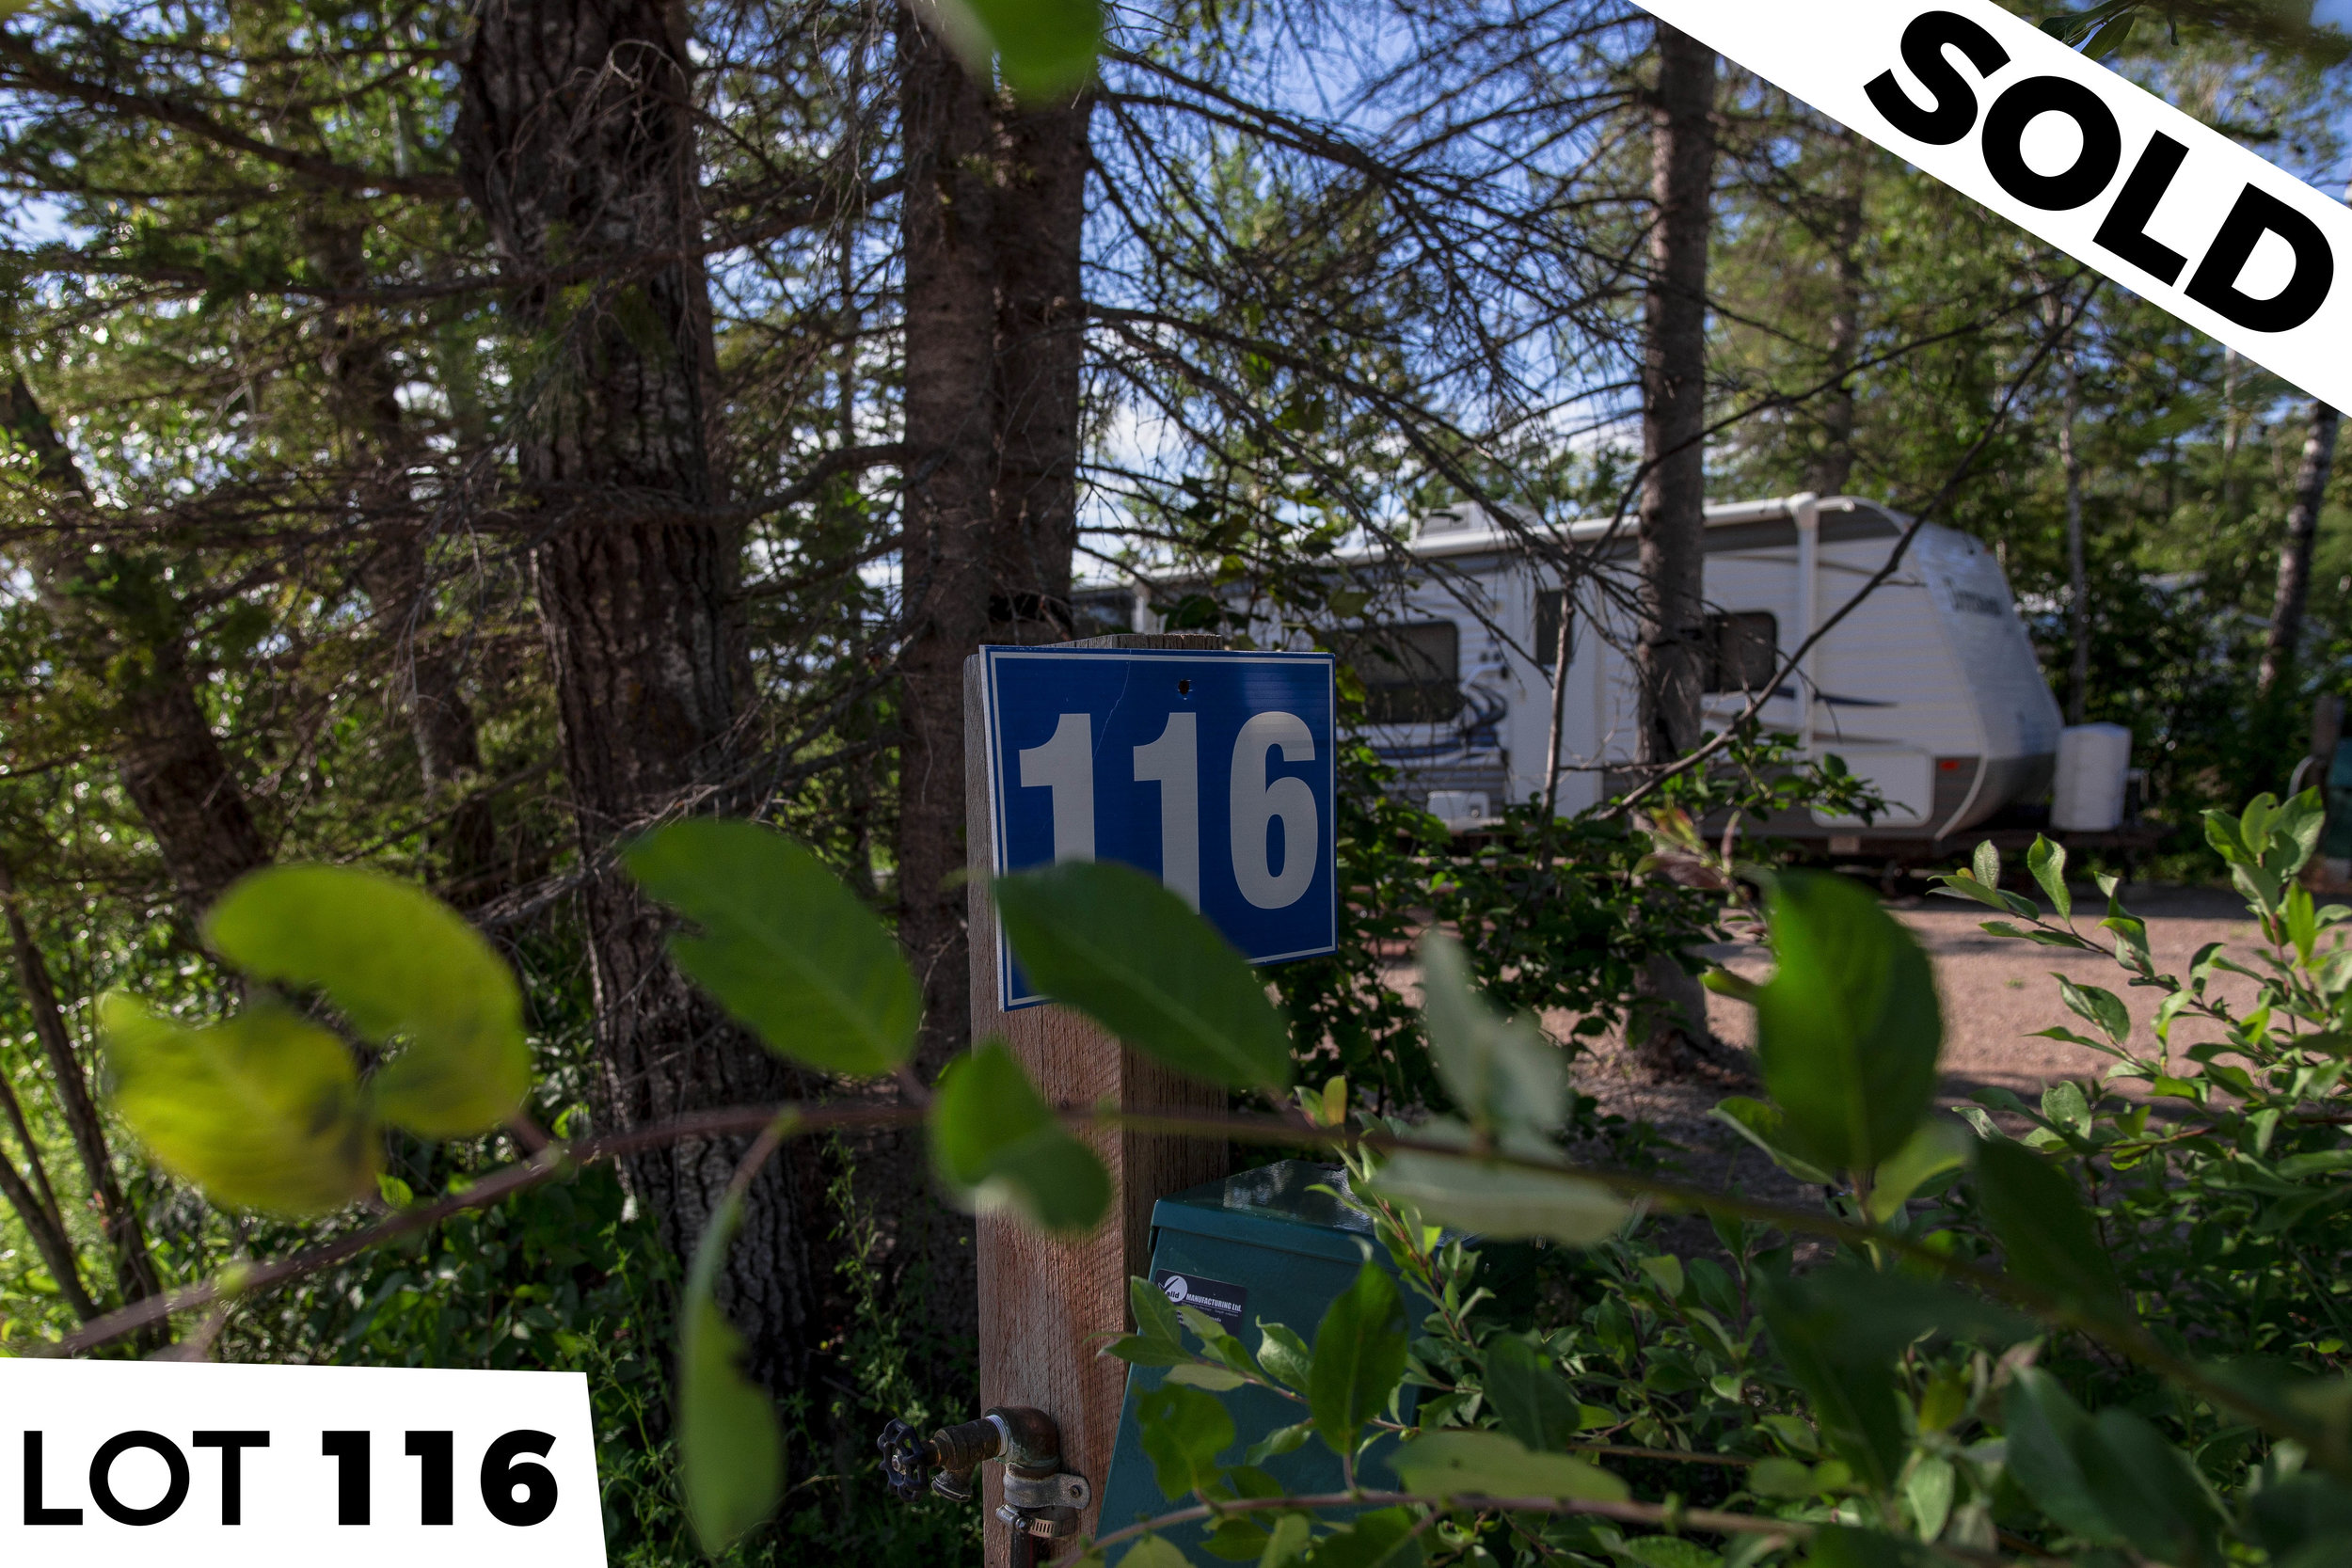 Grand Palms RV Resort - Lot #116